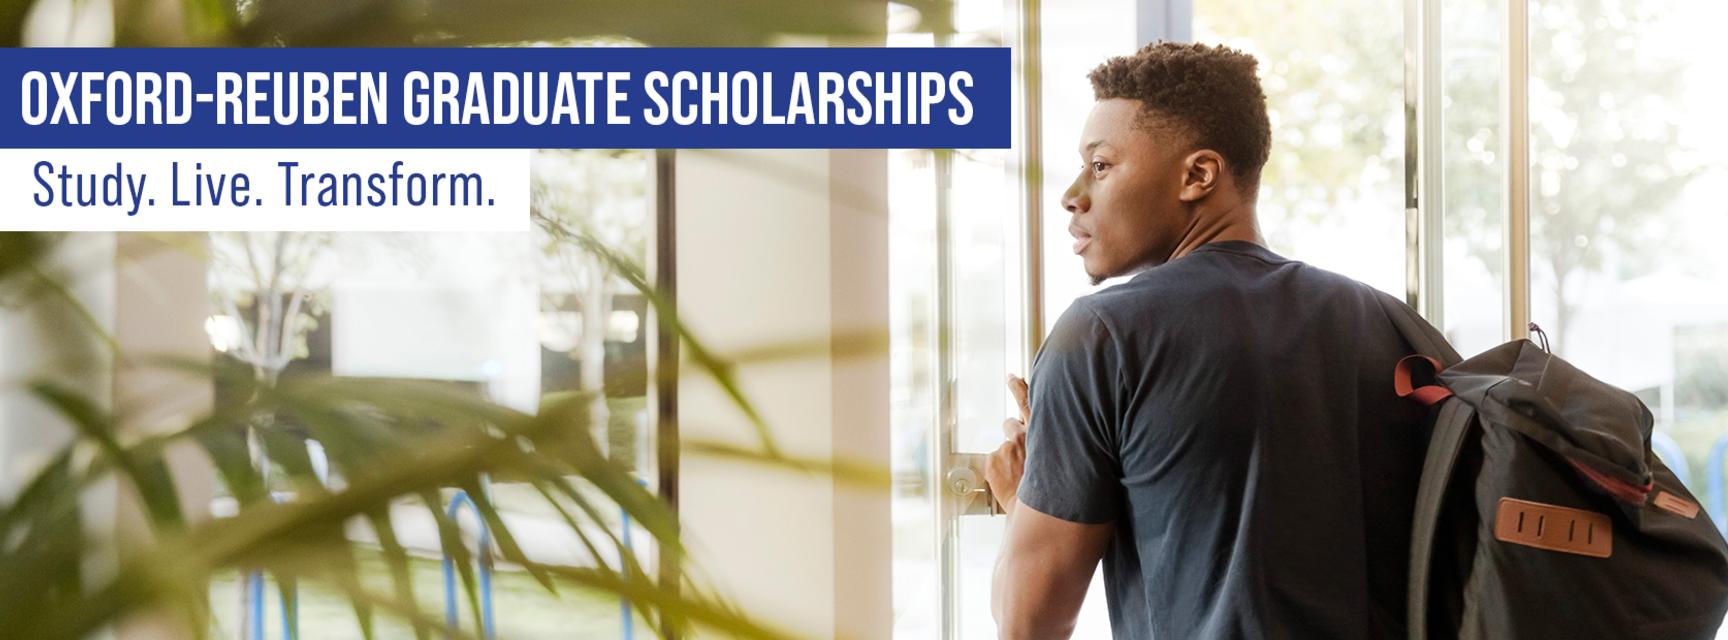 Oxford-Reuben Graduate Scholarships